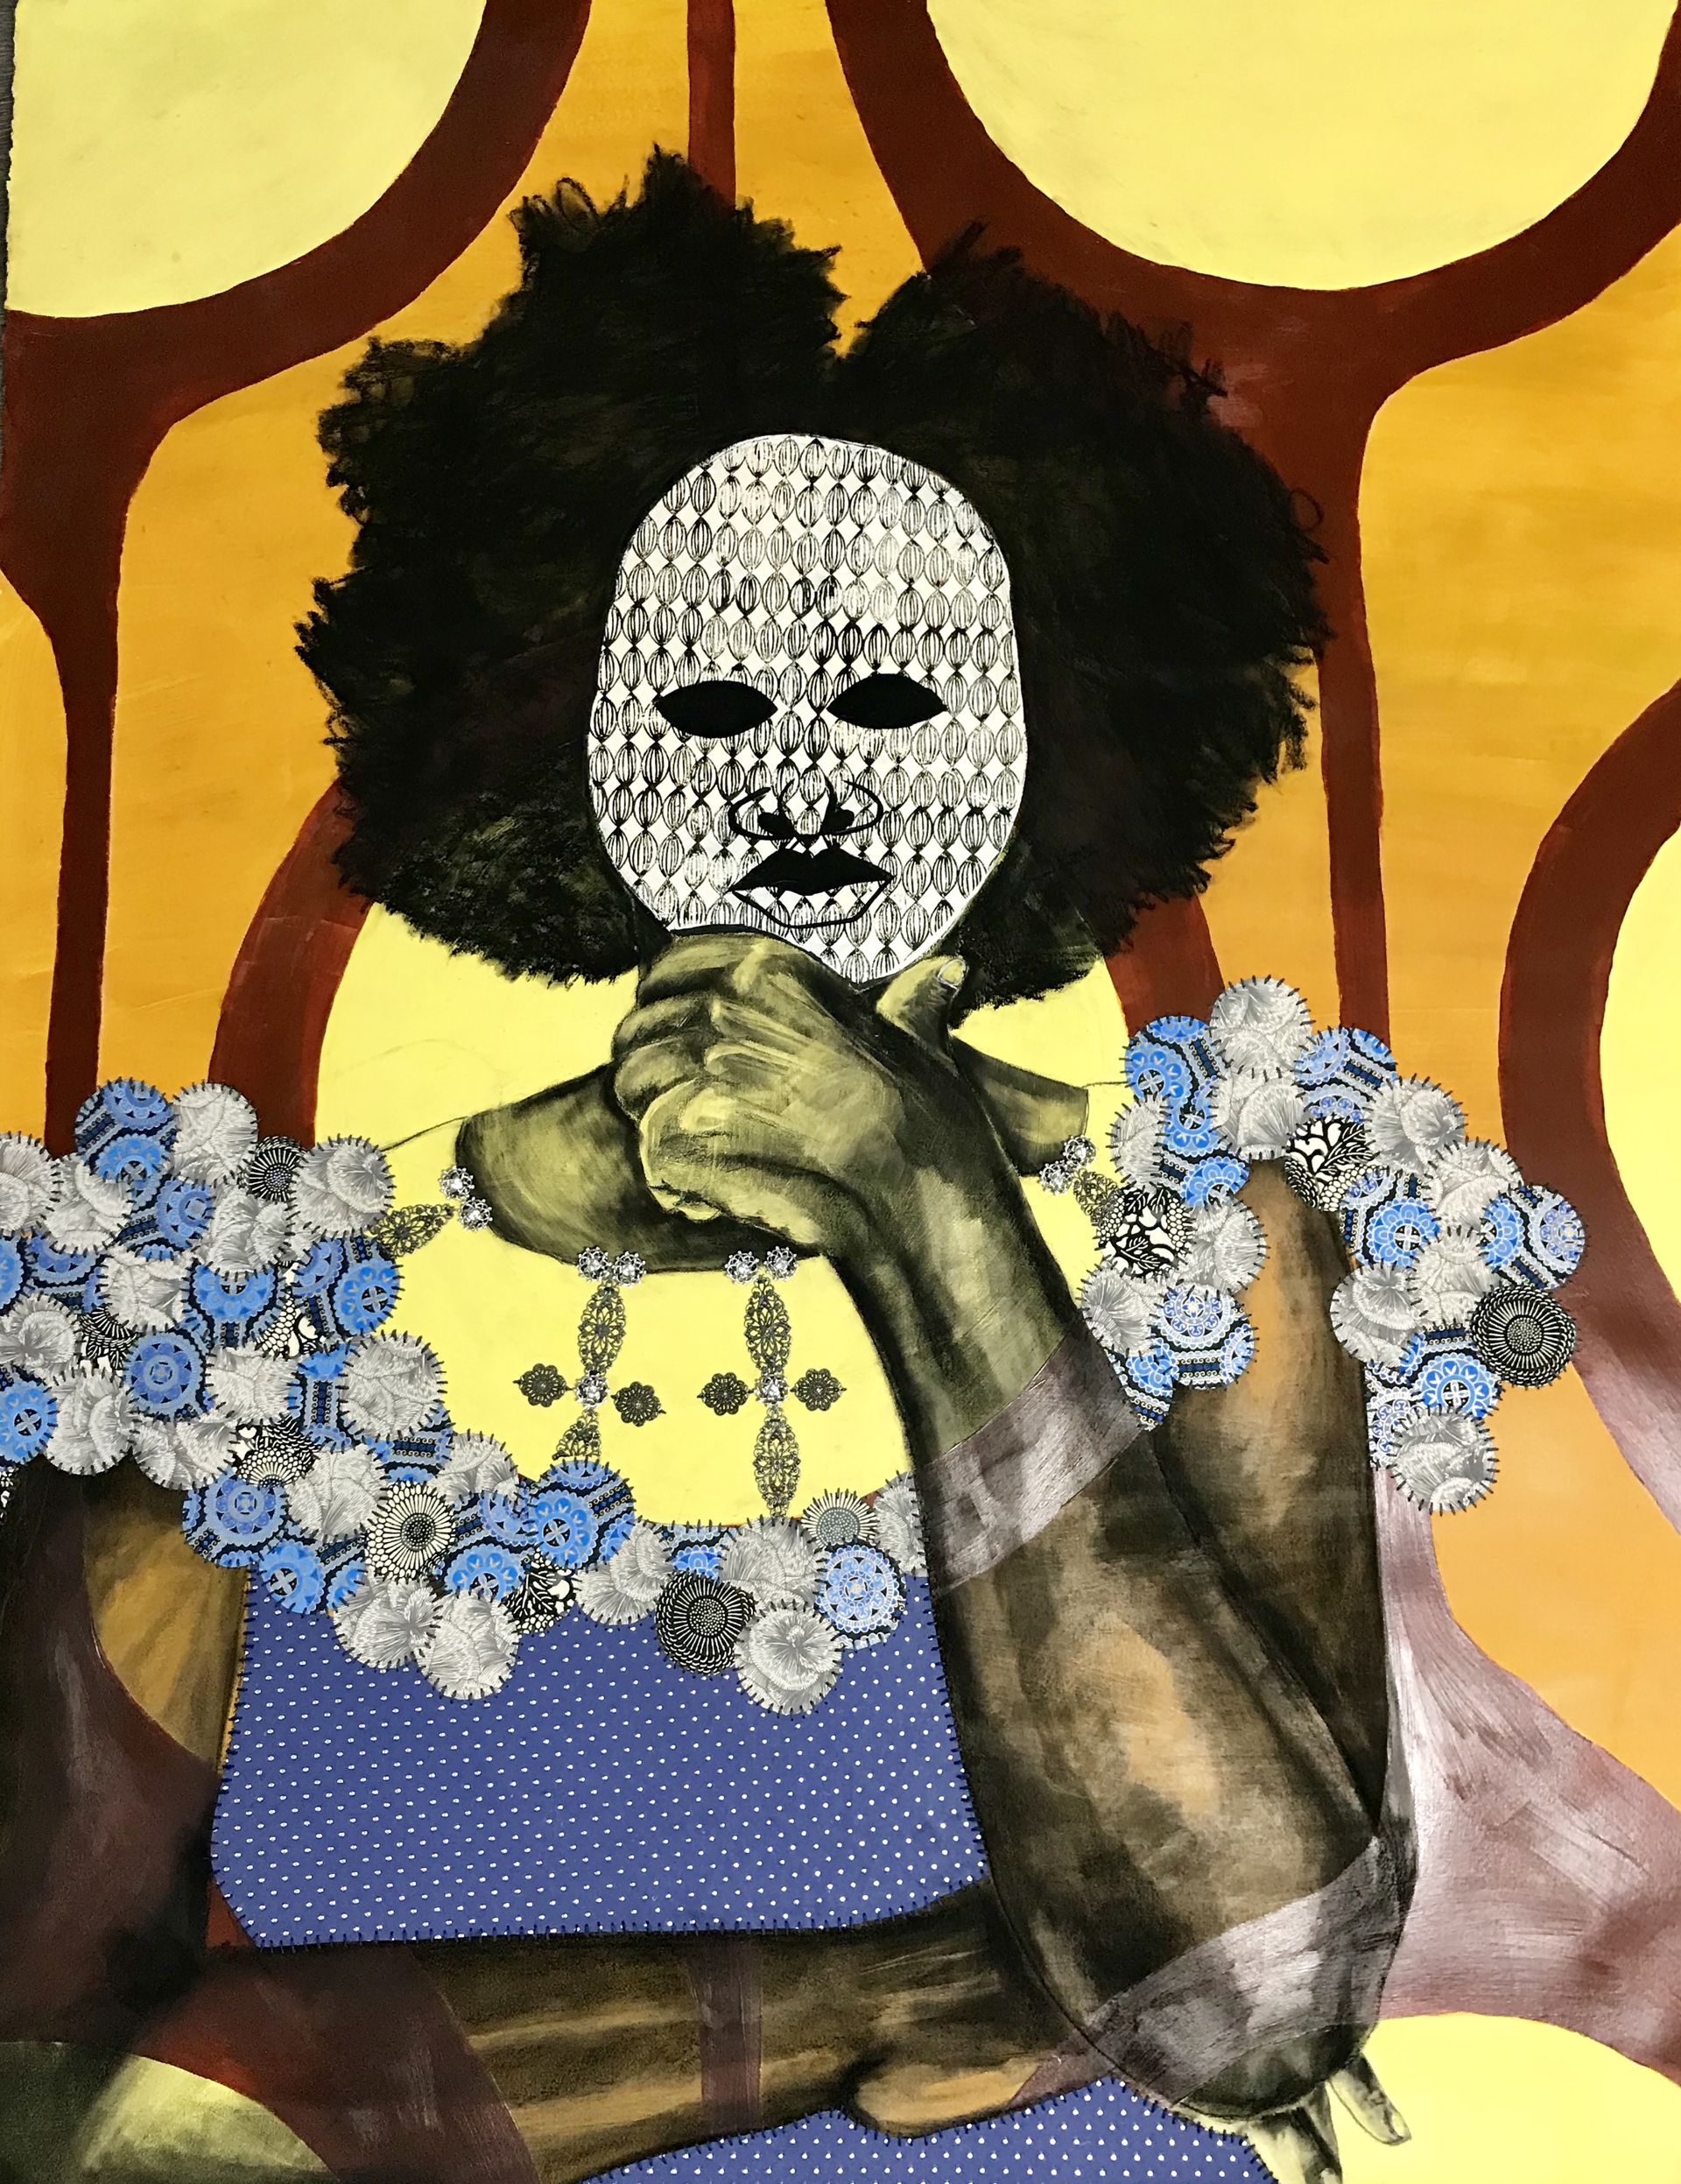 The Mask I Wear by Delita Martin